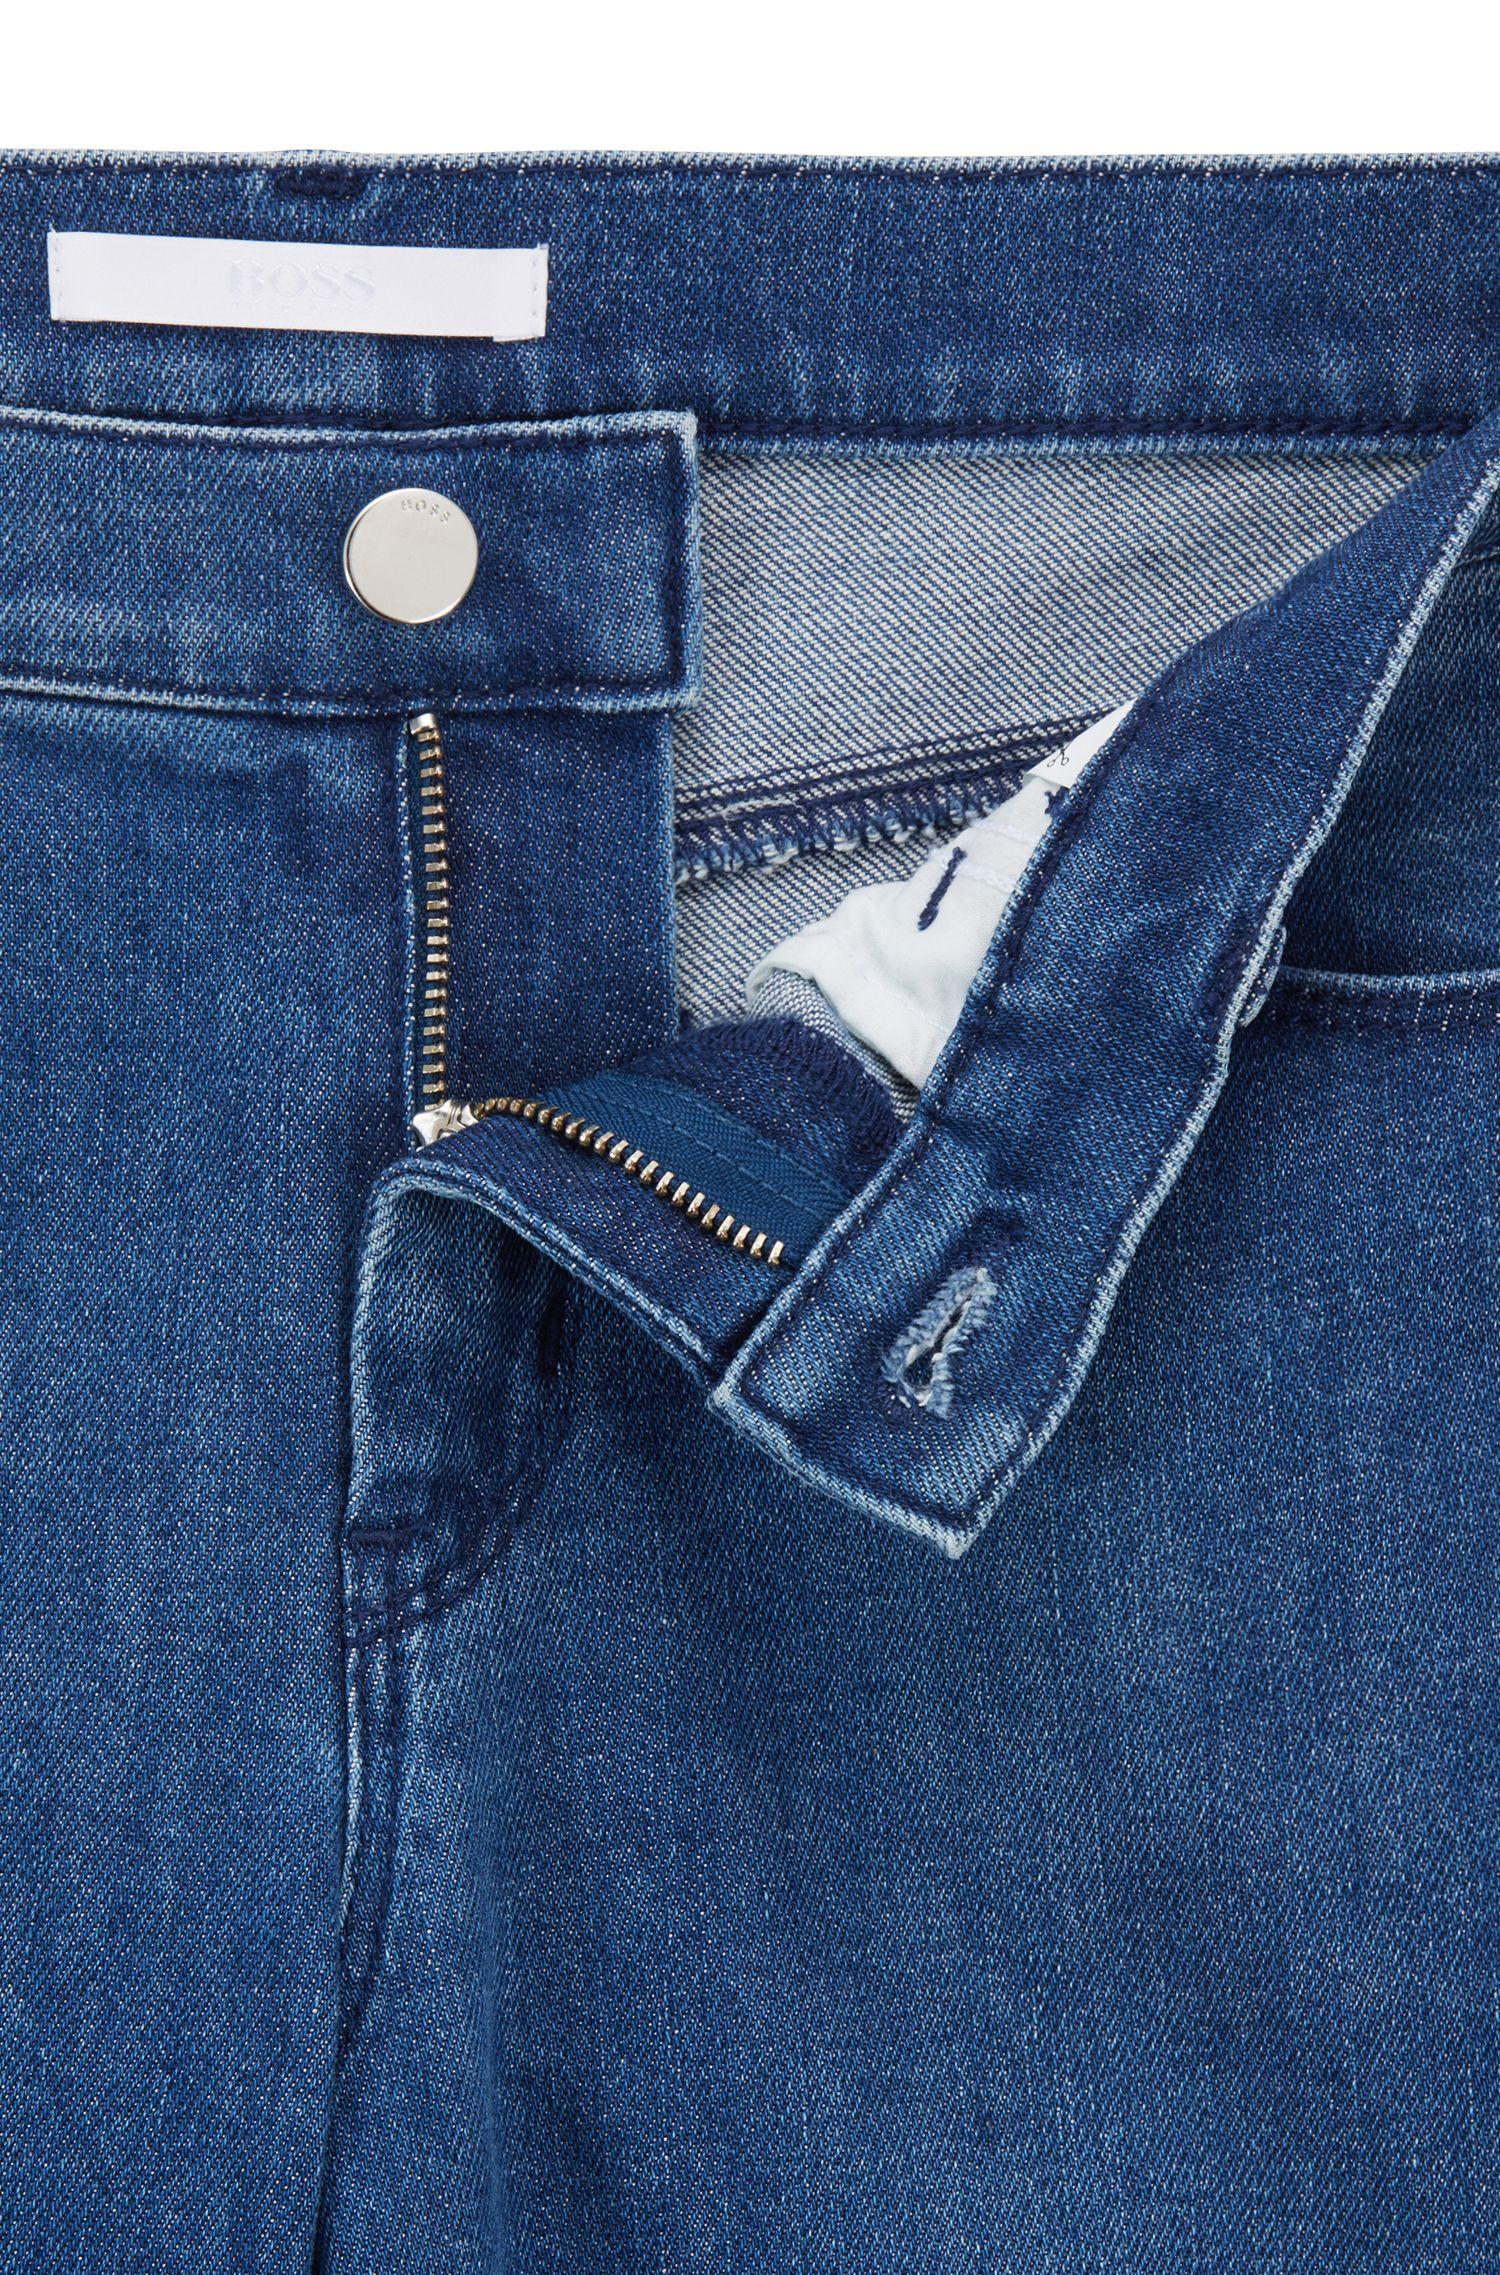 Hugo Boss - Skinny-Fit Jeans aus komfortablem Stretch-Denim - 6